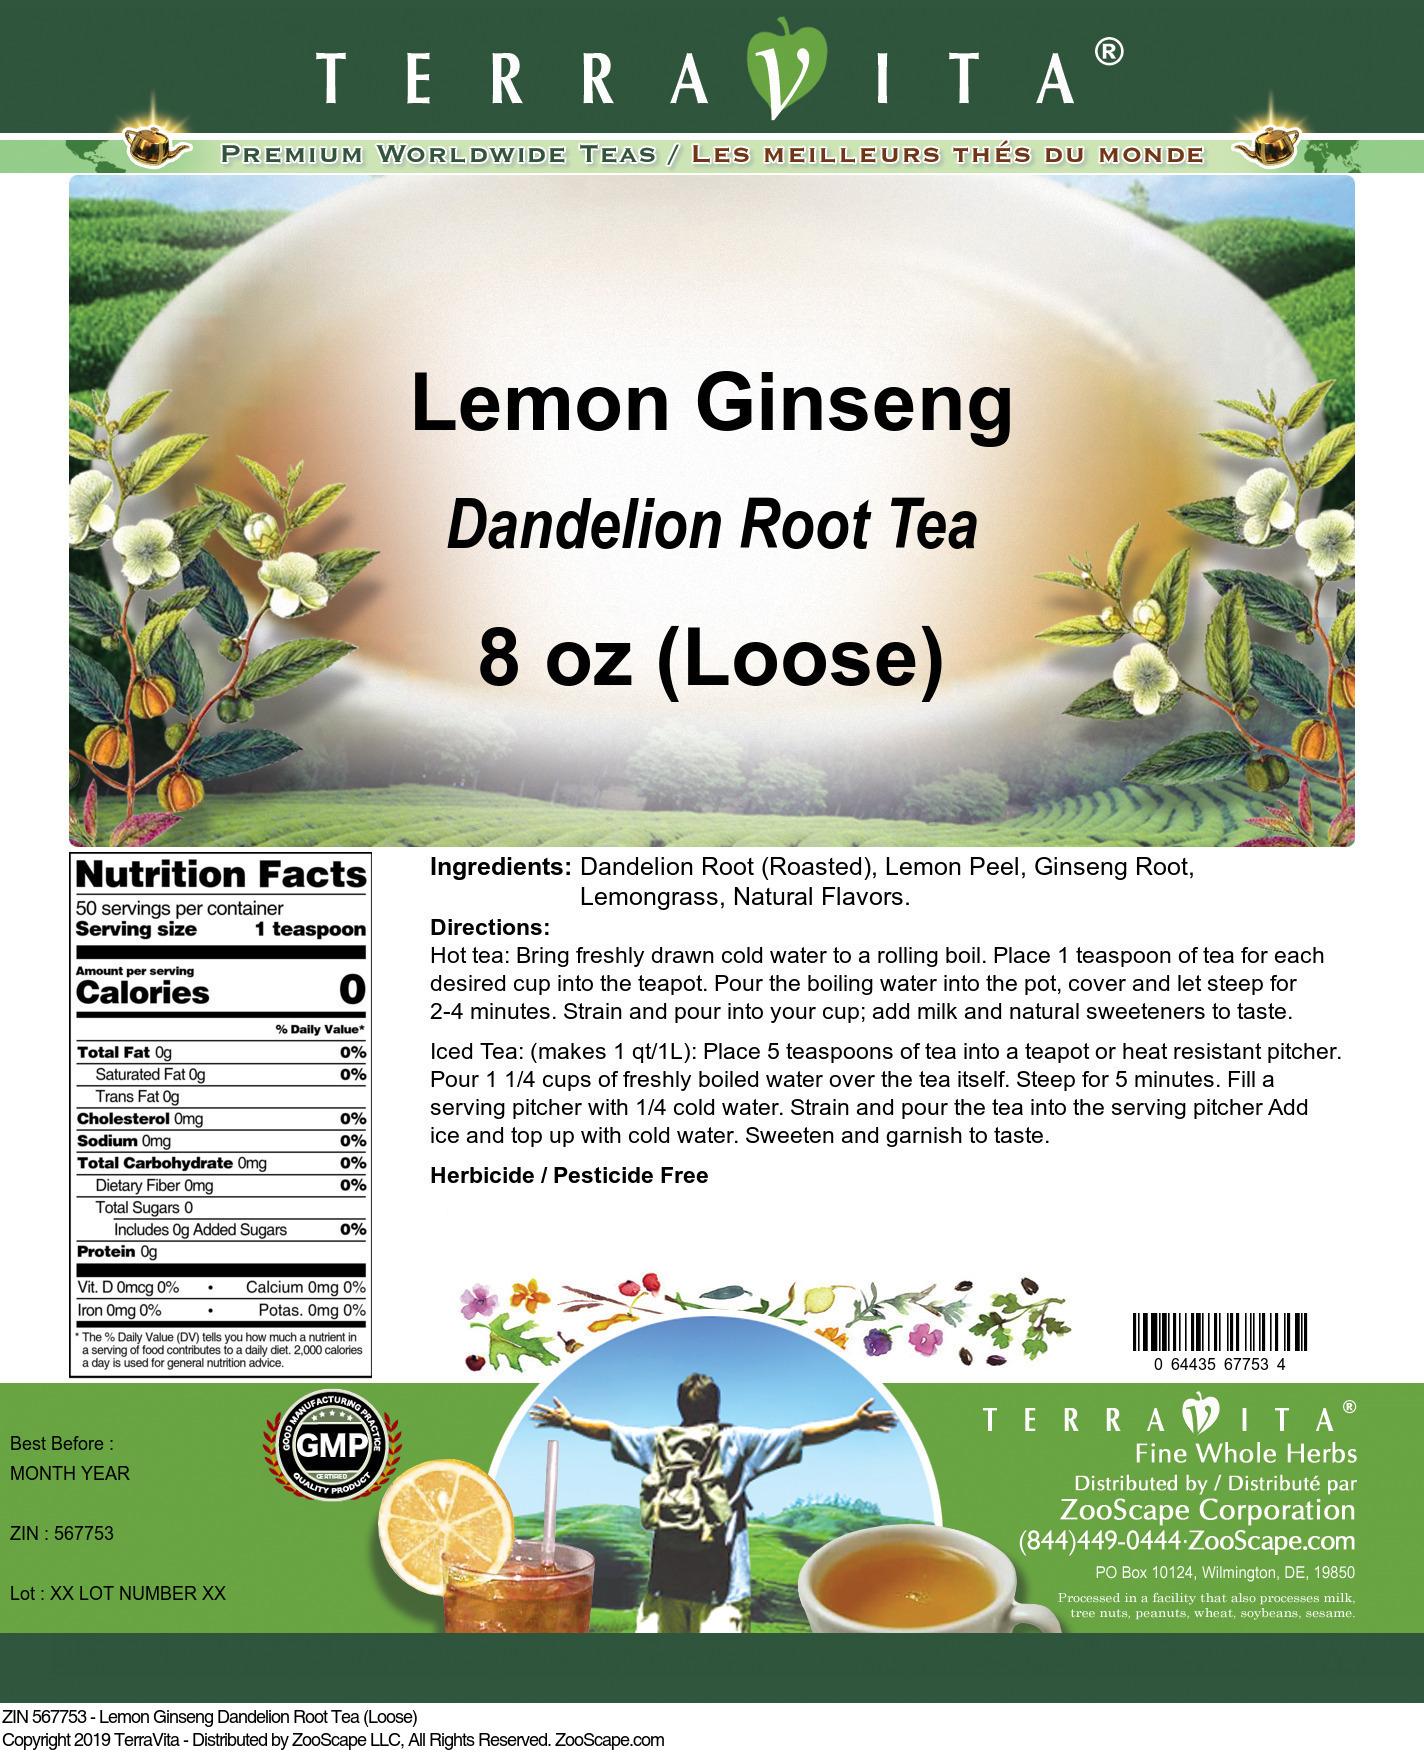 Lemon Ginseng Dandelion Root Tea (Loose)